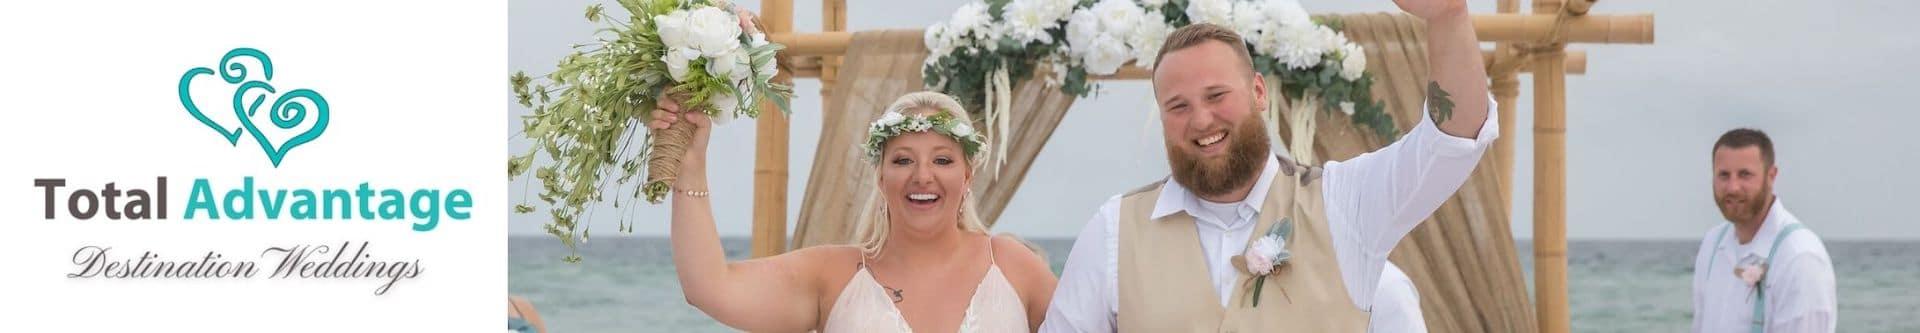 Destination Weddings Total Advantage - Group Travel